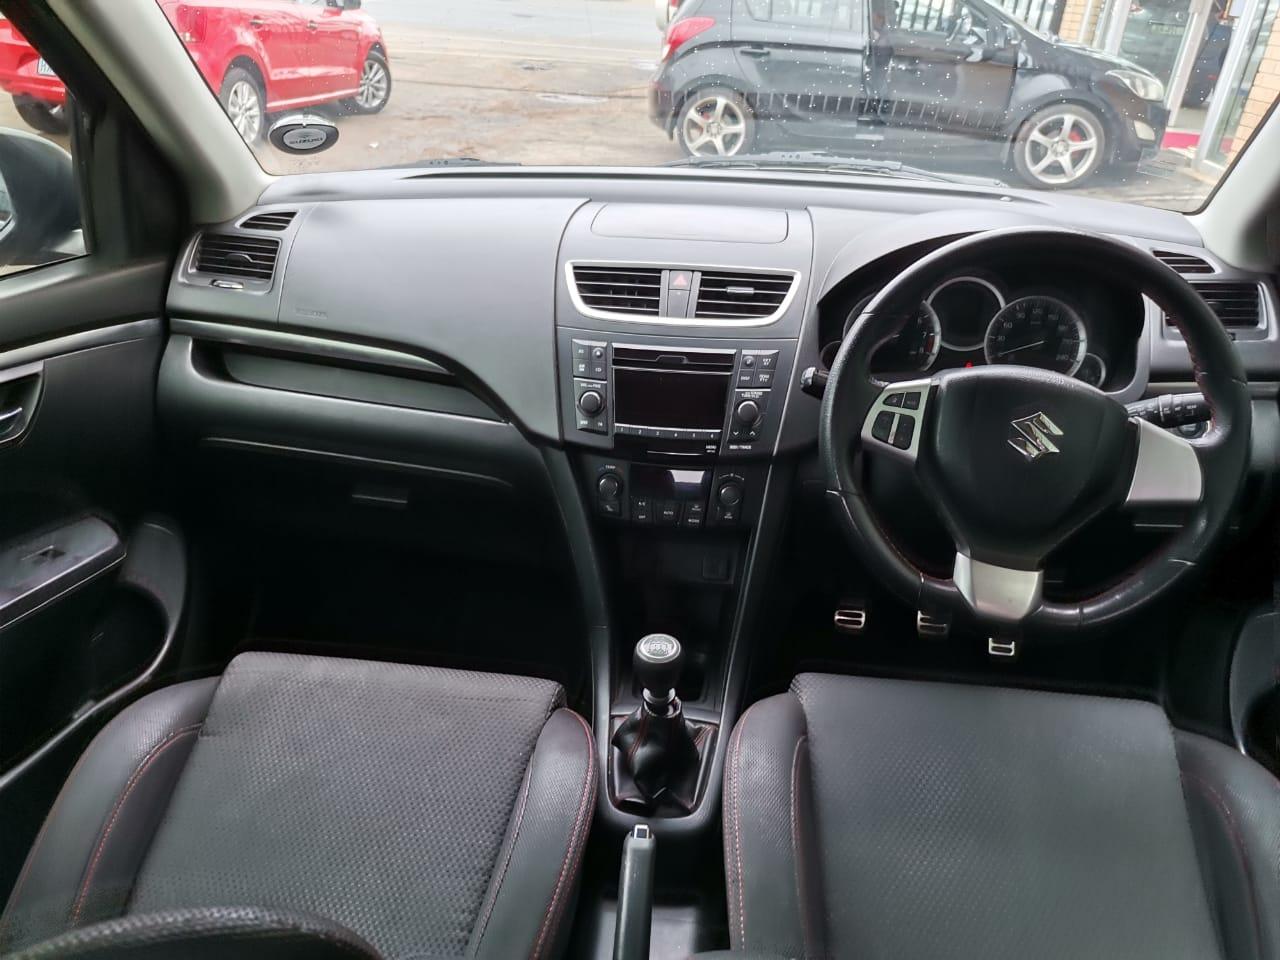 2013 Suzuki Swift 1.4 GL